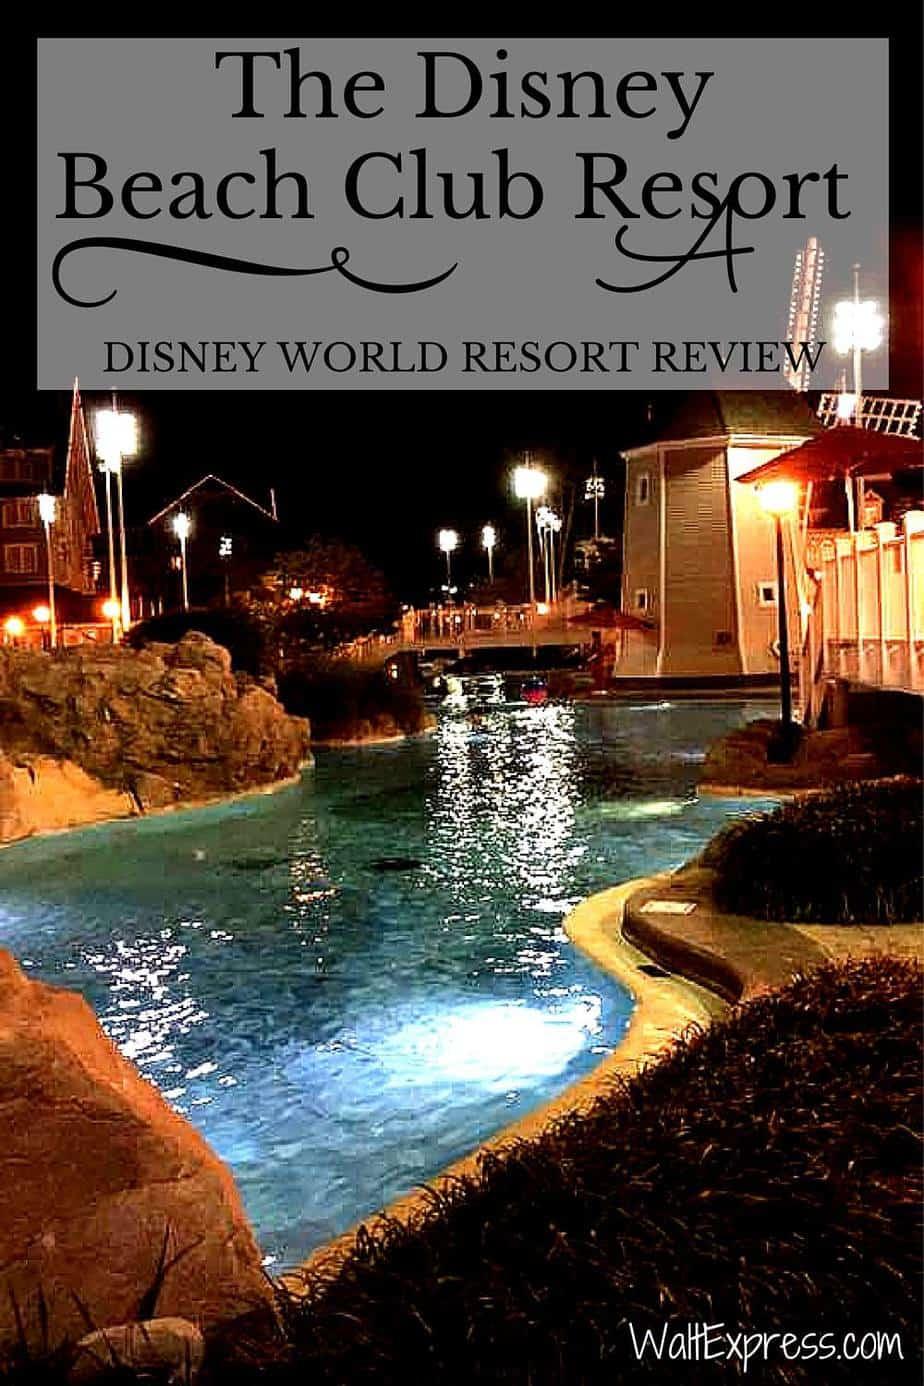 Disney's Beach Club Resort: A Disney World Resort